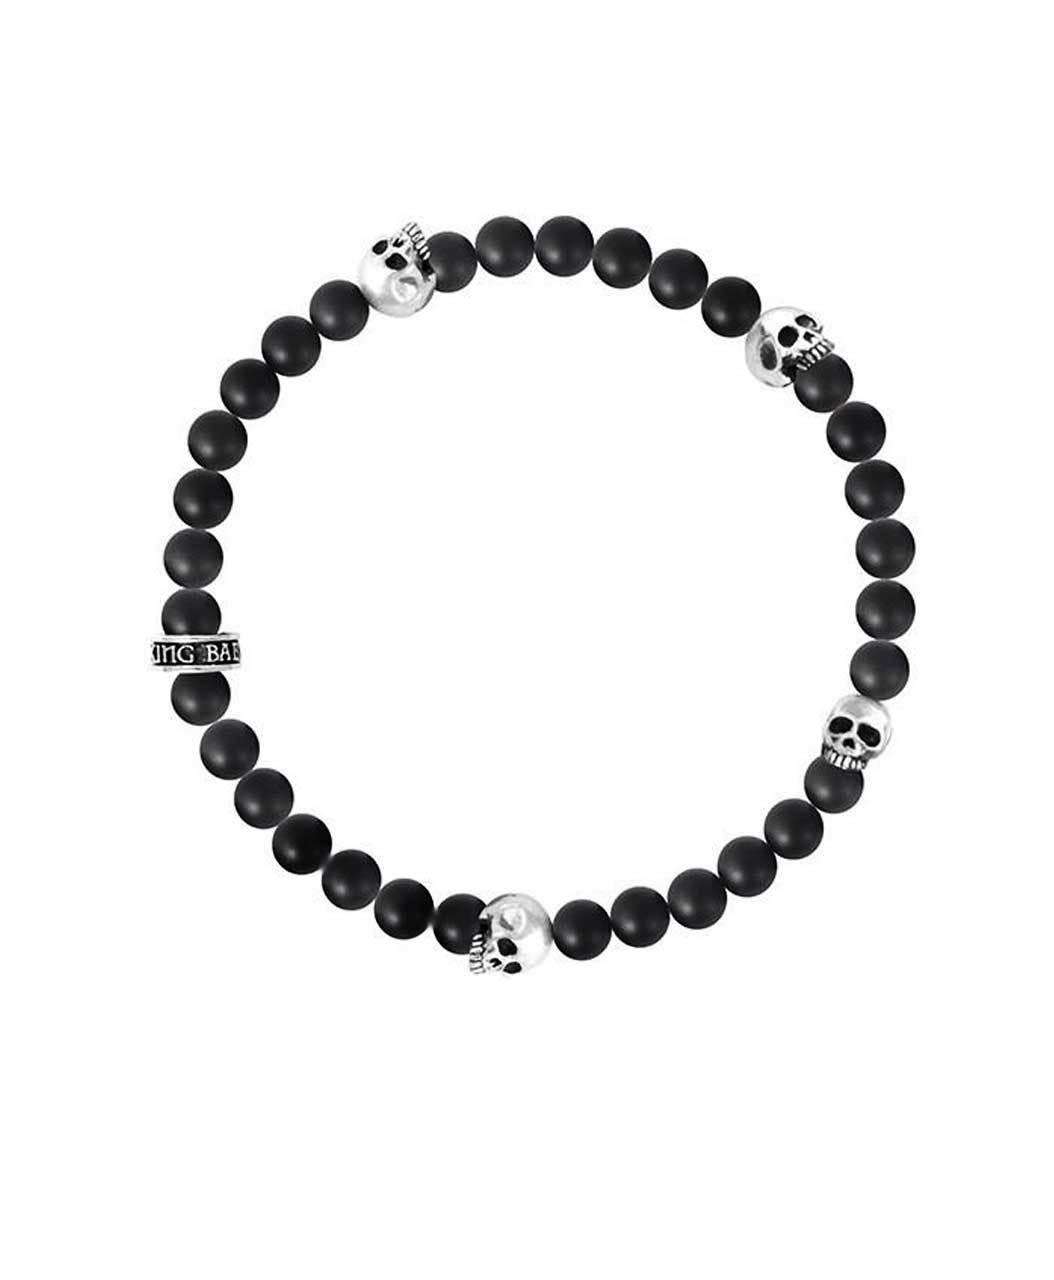 King Baby Black Onyx Bracelet With 4 Skulls